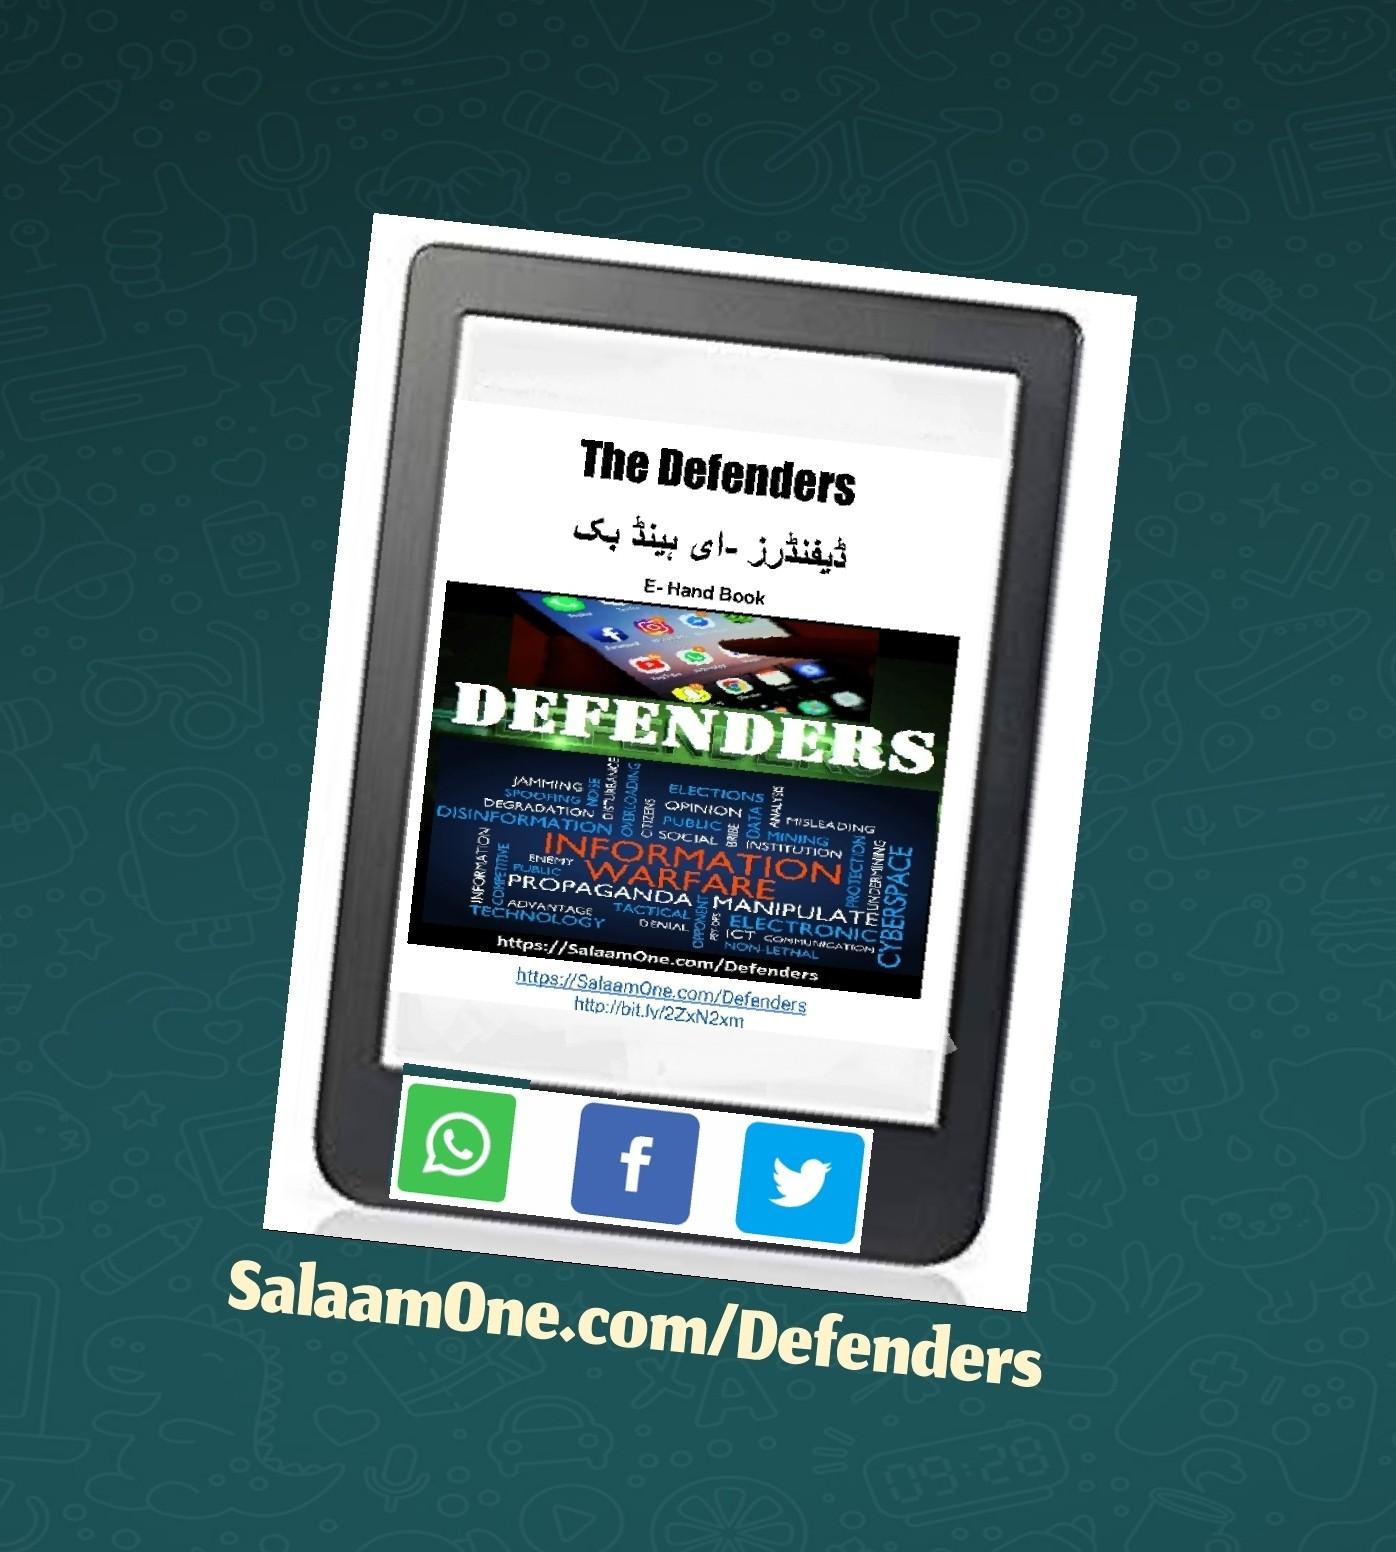 DEFENDERS ڈیفنڈرز - Cover